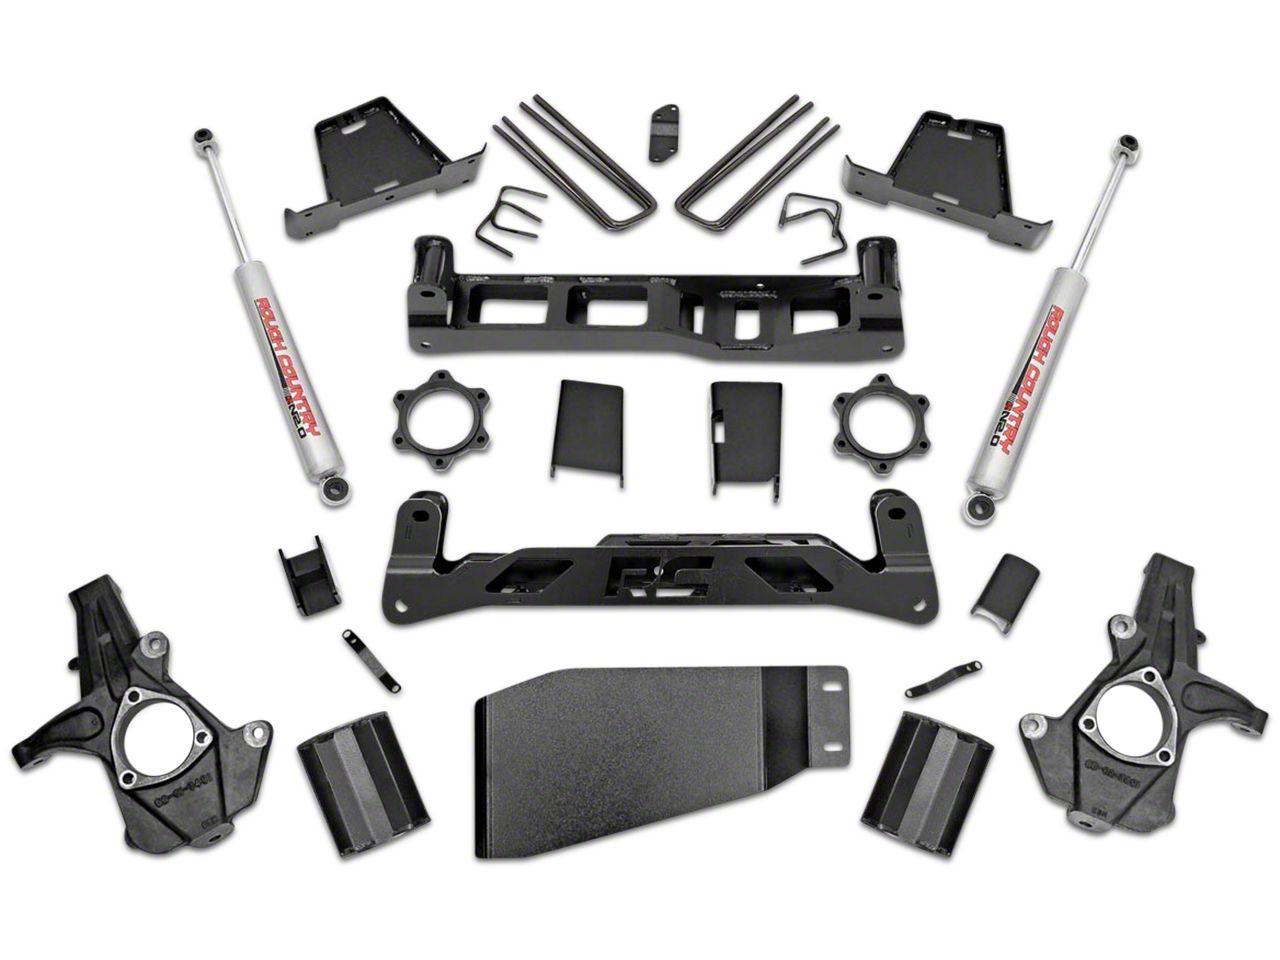 Rough Country 7.5 in. Suspension Lift Kit w/ Premium N3 Shocks - No Struts (07-13 4WD Sierra 1500)